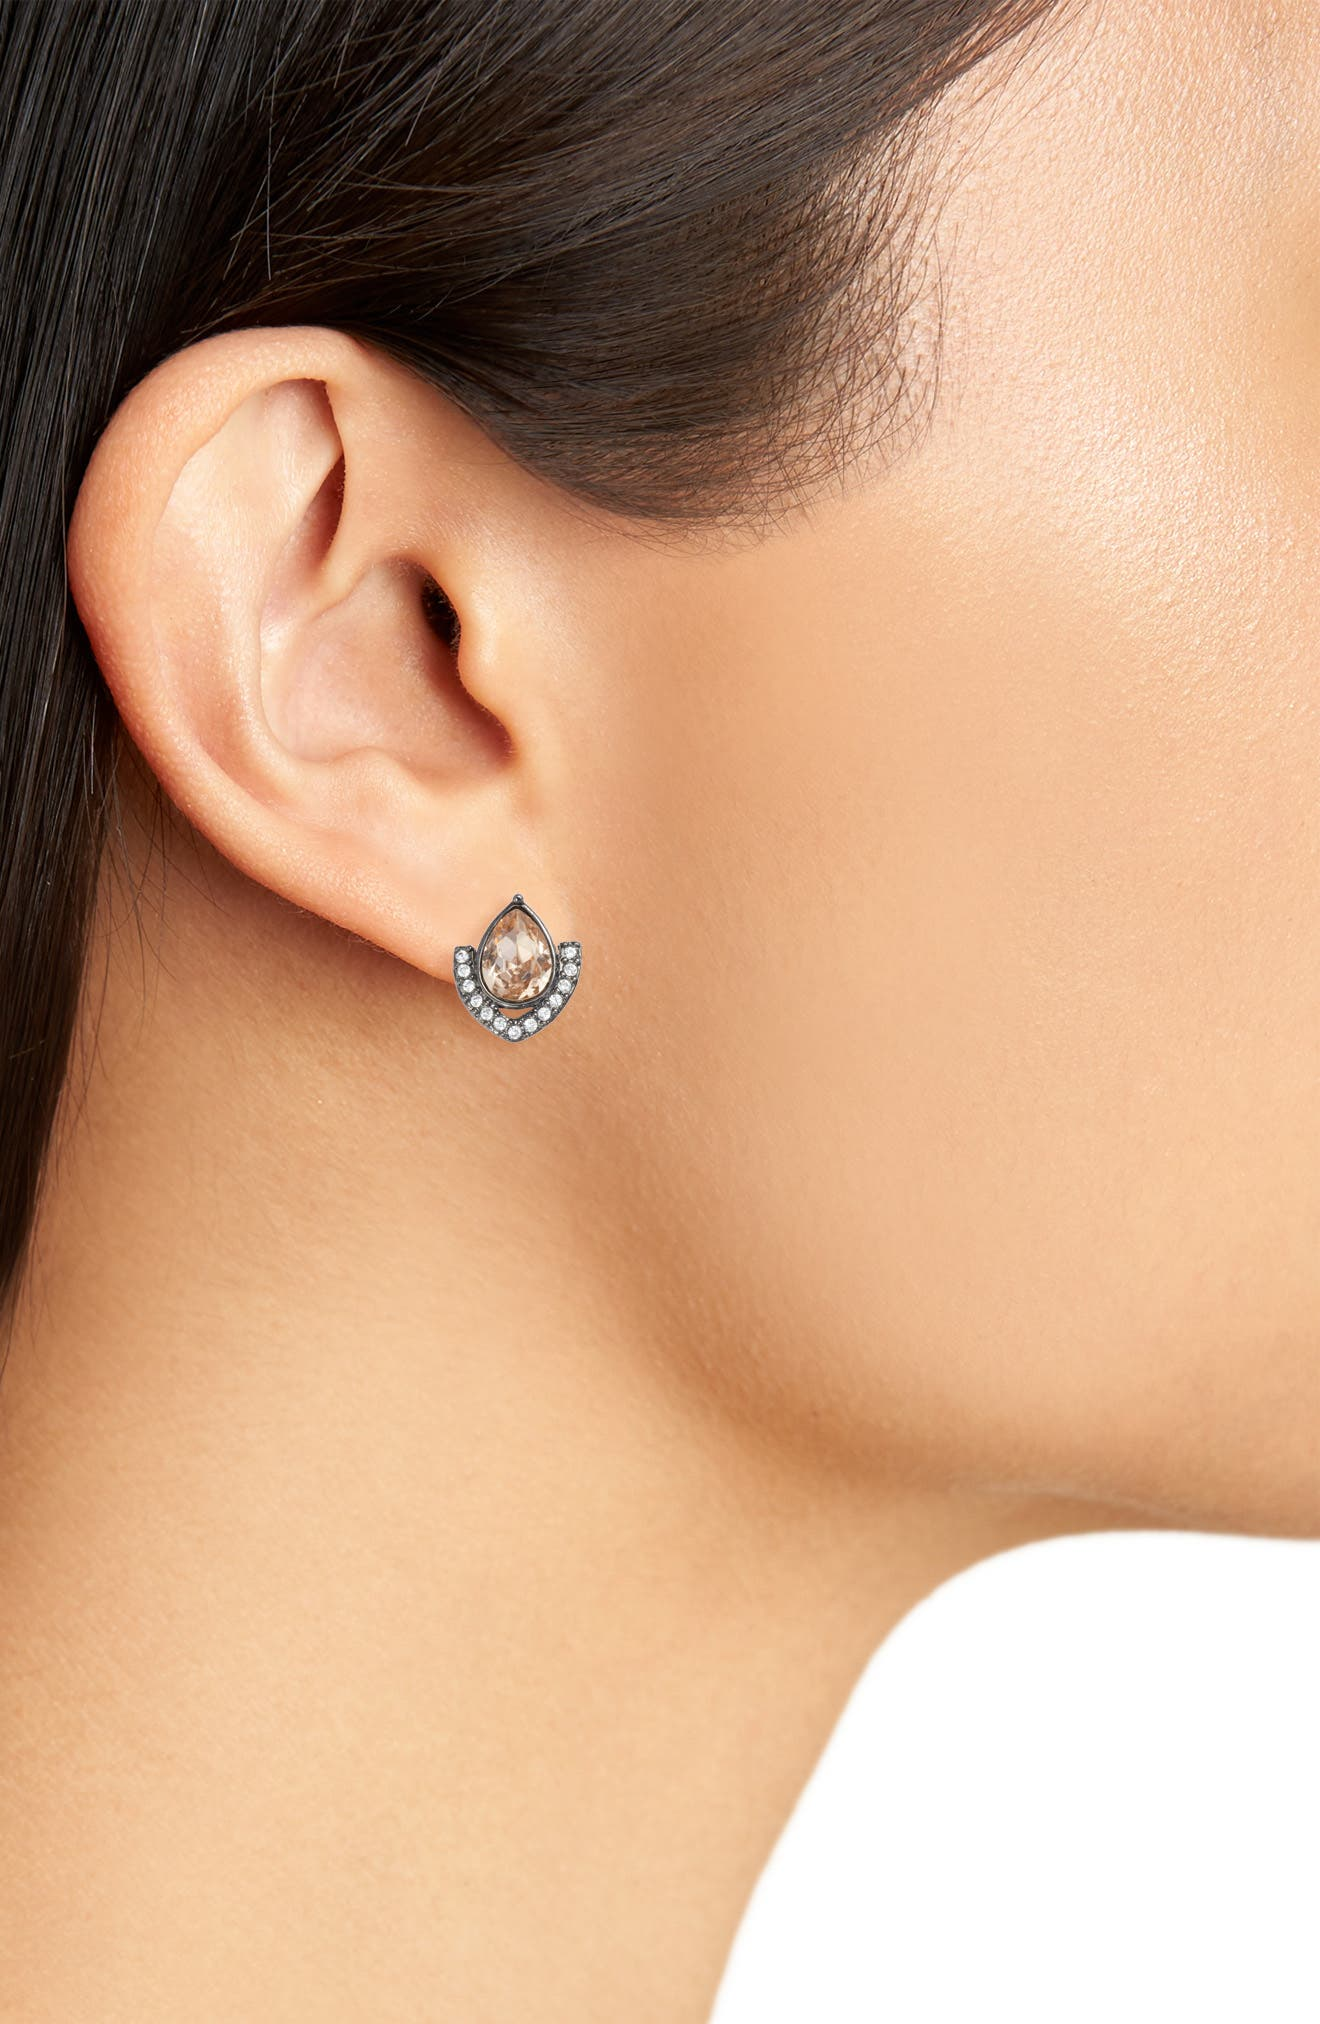 Crystal Stud Earrings,                             Alternate thumbnail 2, color,                             Blush/ Crystal